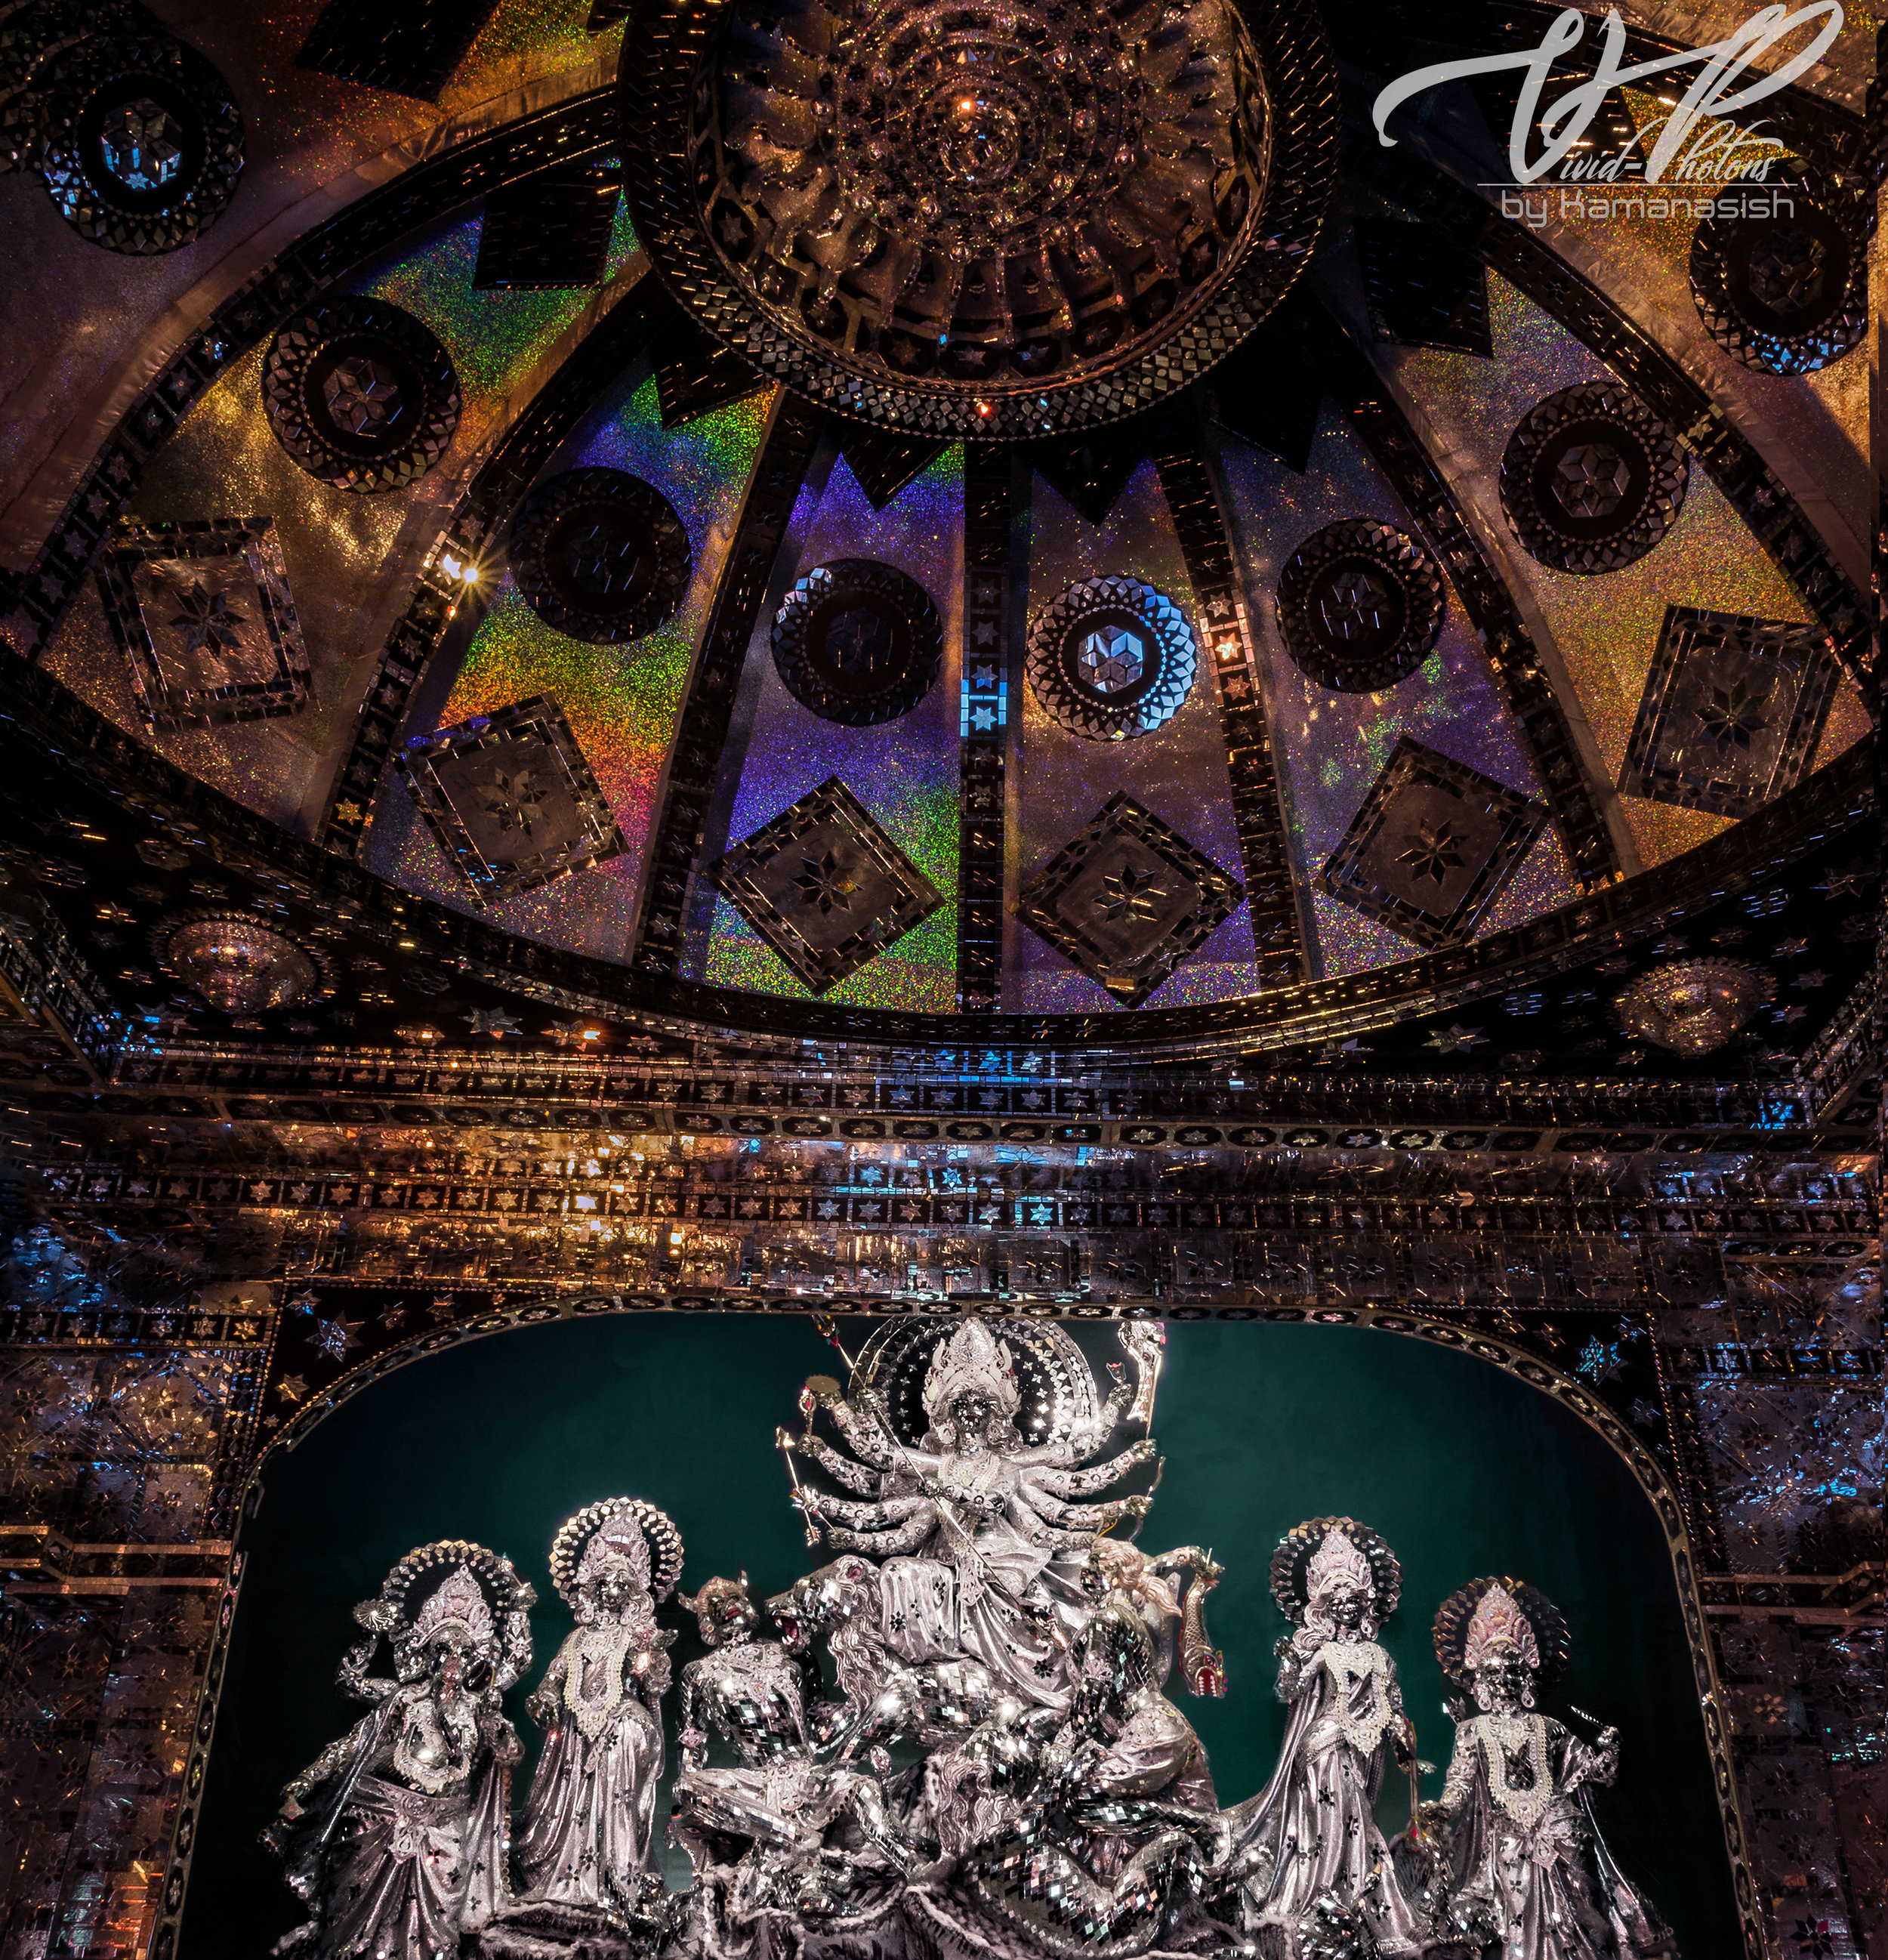 Durga Puja glass jpg.jpg